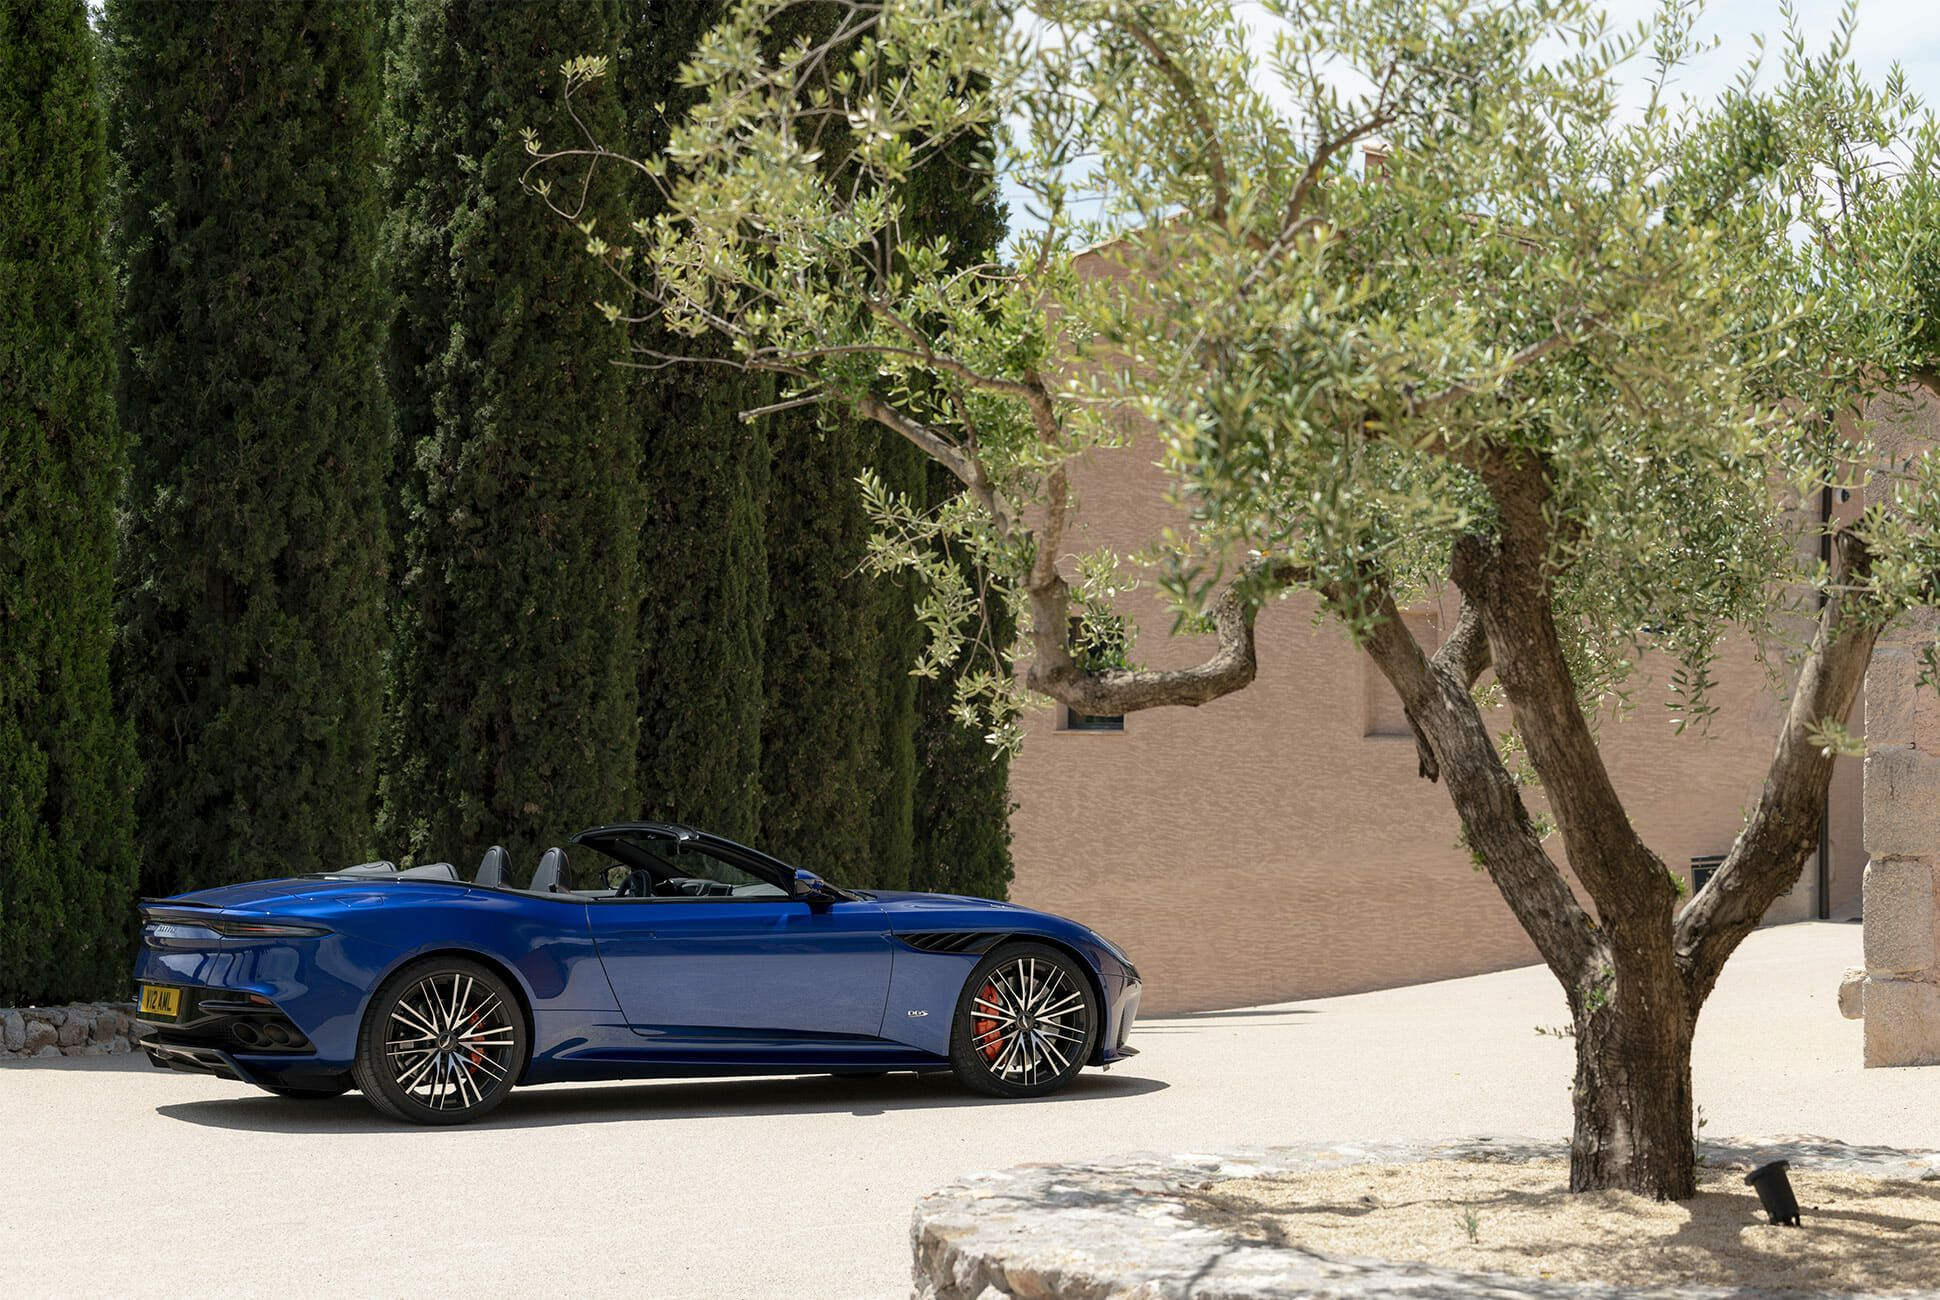 Aston-Martin-DBS-Superleggera-Volante-Review-gear-patrol-slide-2